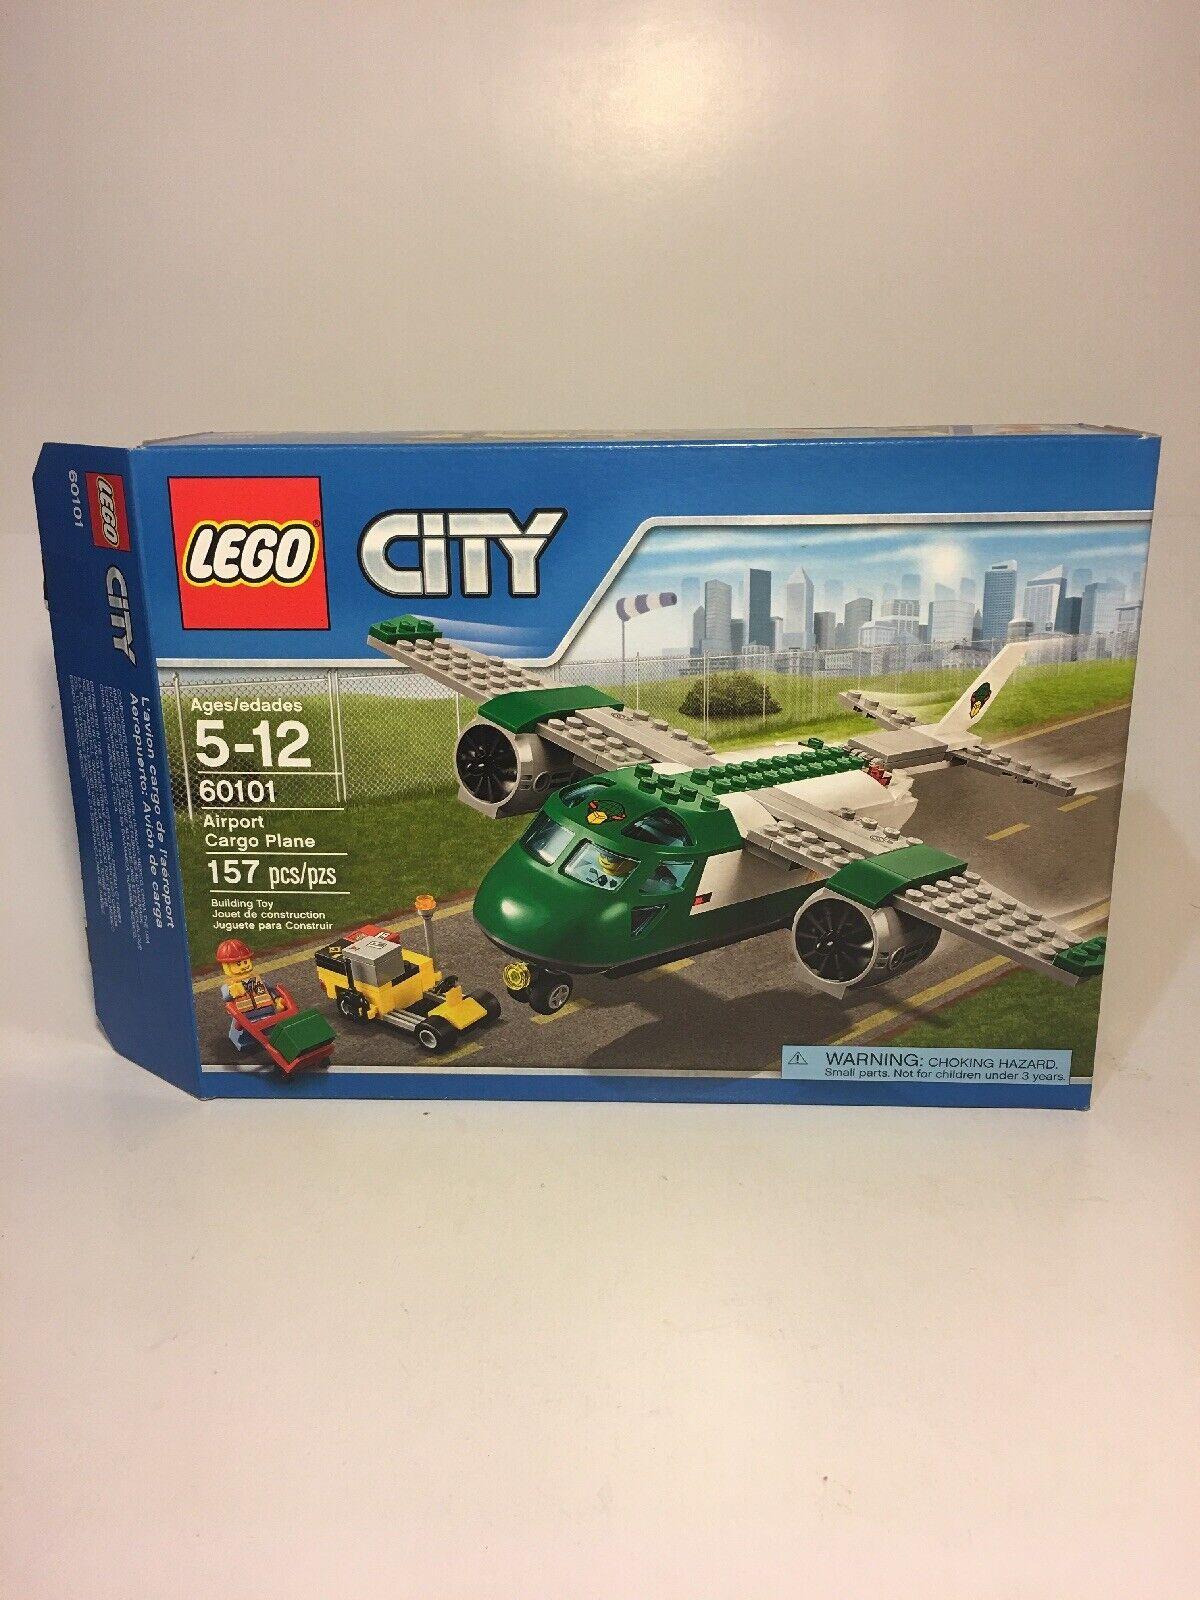 (1-Empty Box Only) For LEGO SET 60101 CITY AIRPORT CARGO PLANE - No Legos Inside